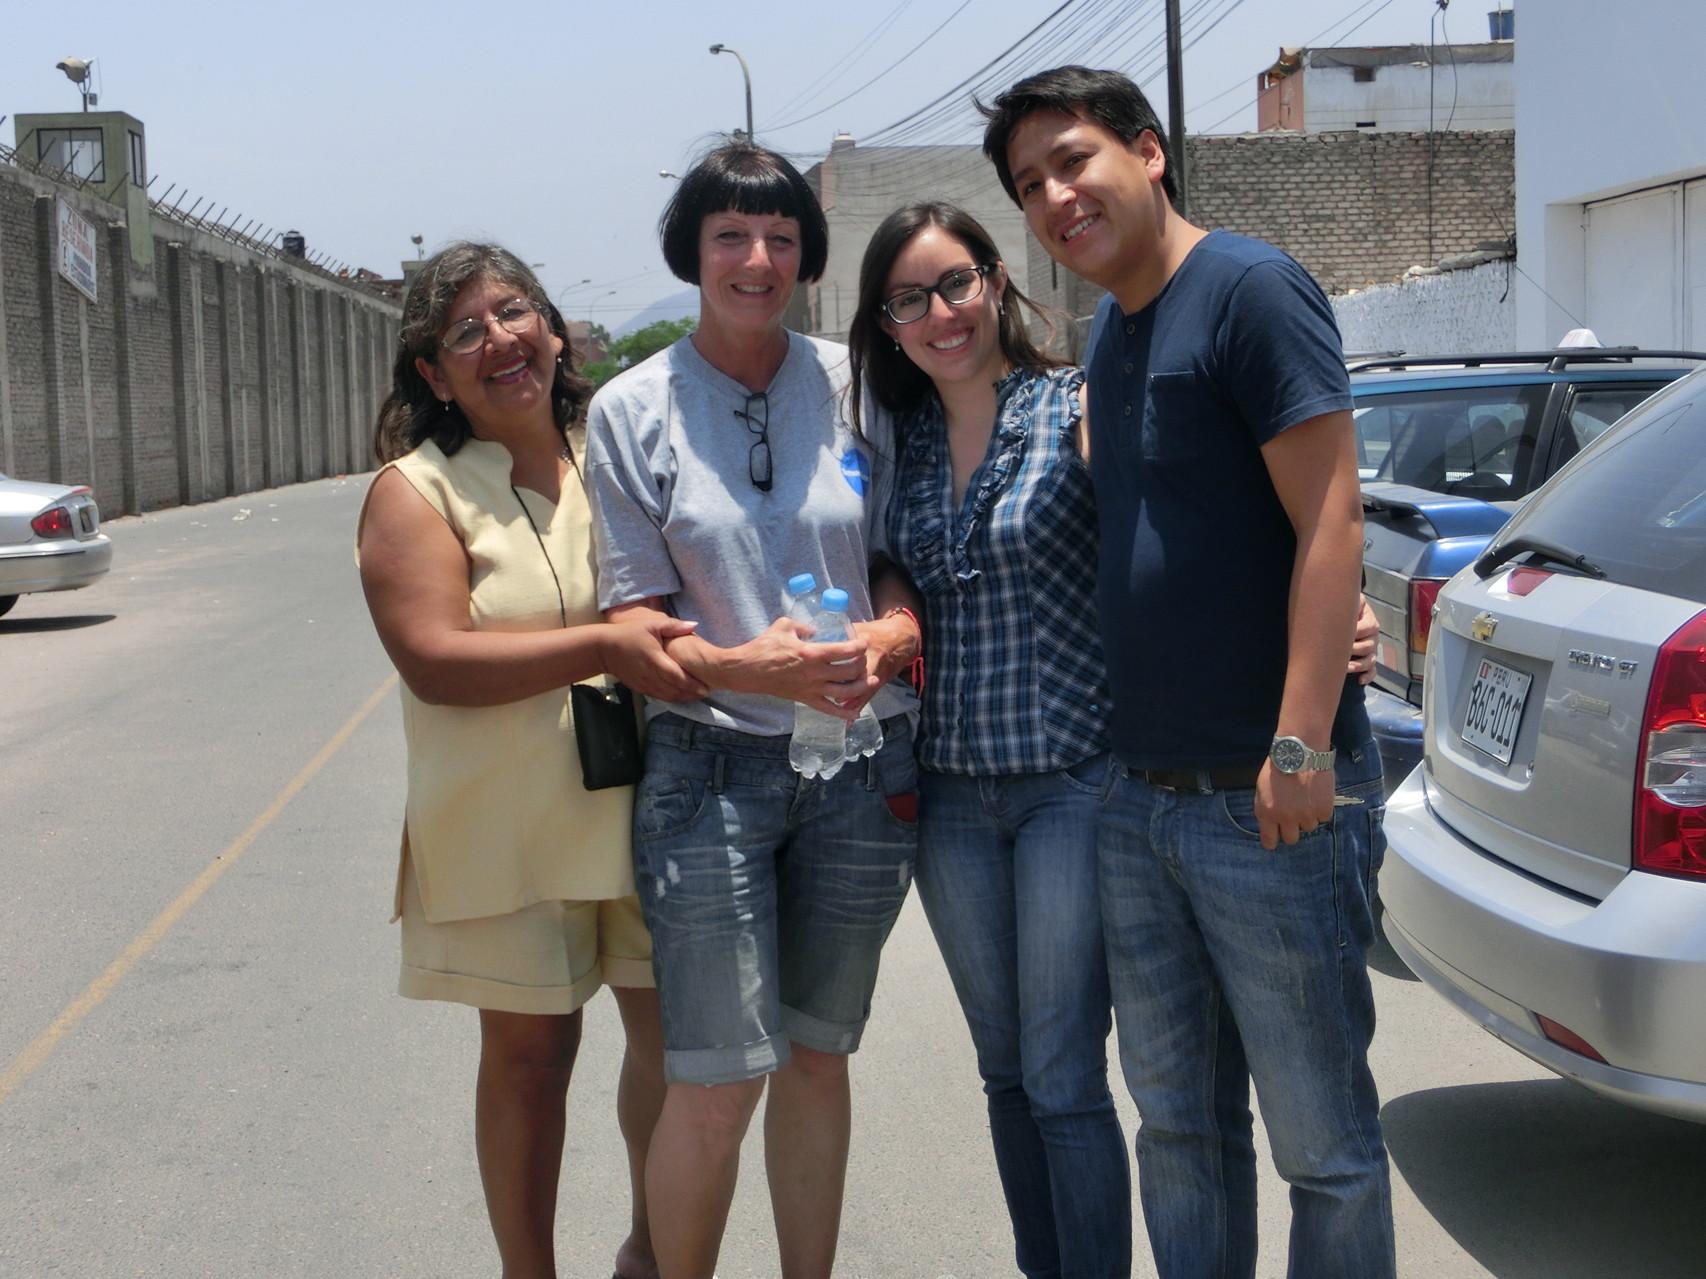 Anita, Rosi, Sandra und Alonso